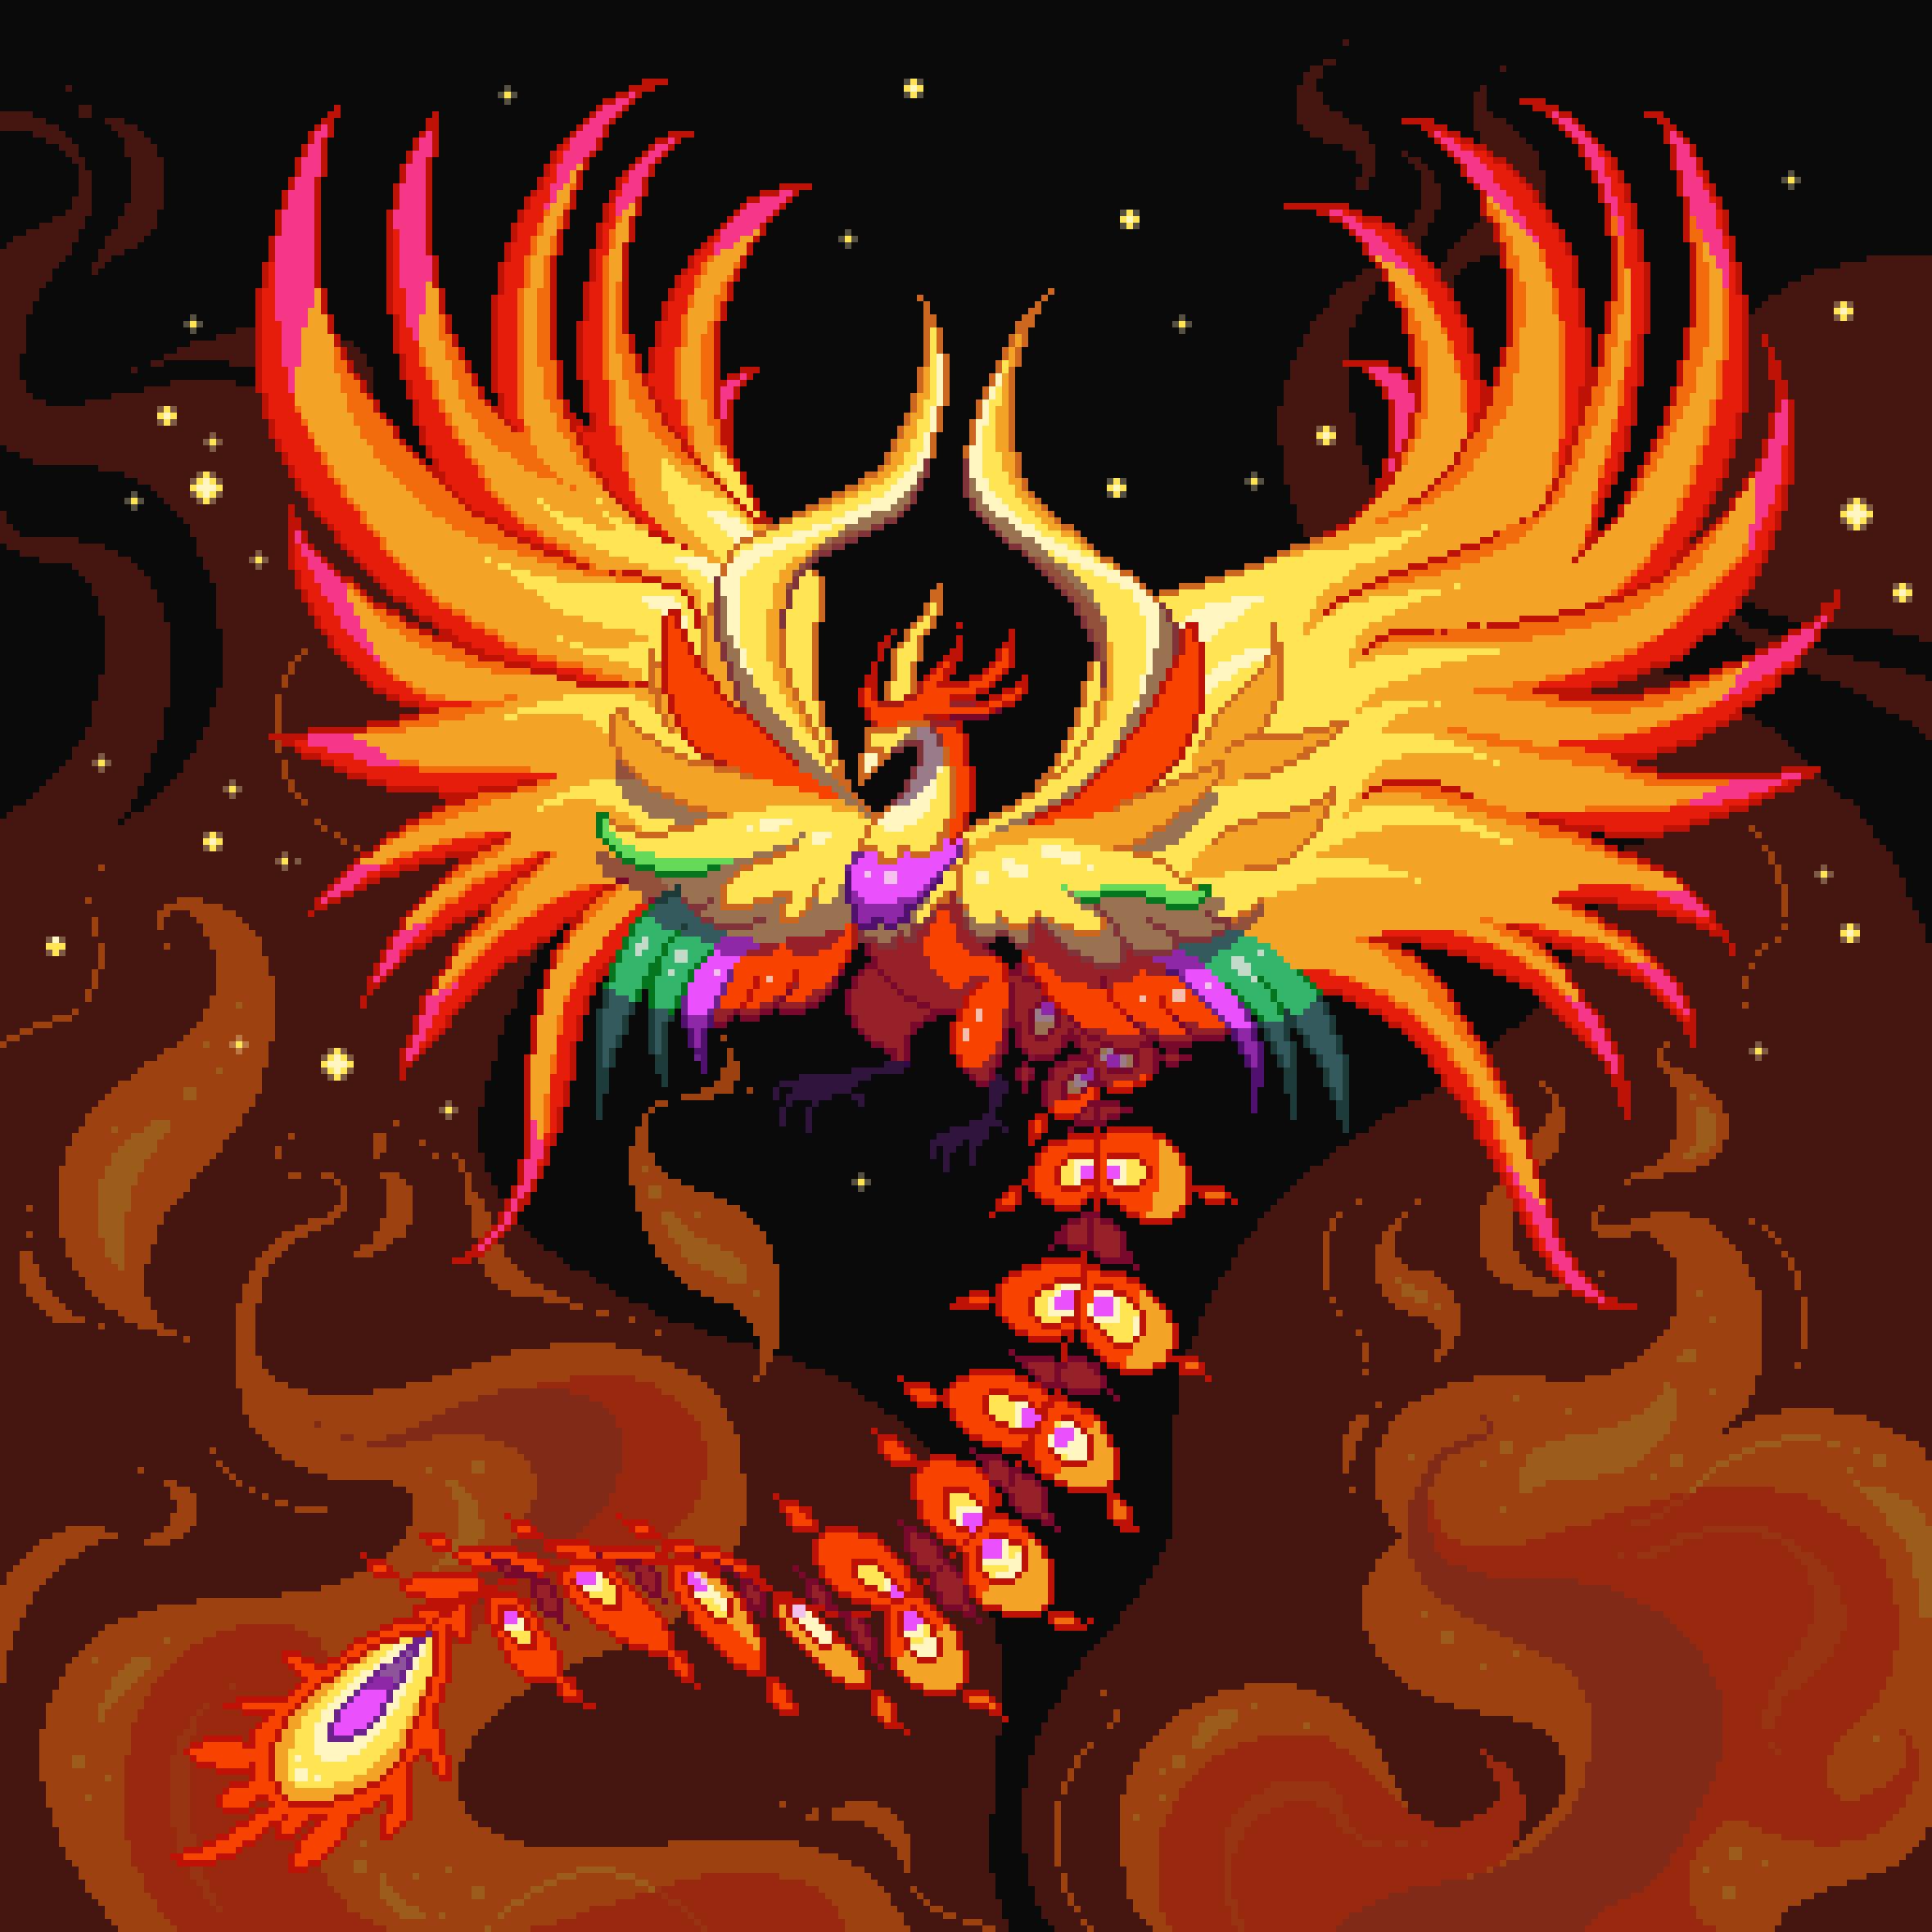 Phoenix from Final Fantasy IX